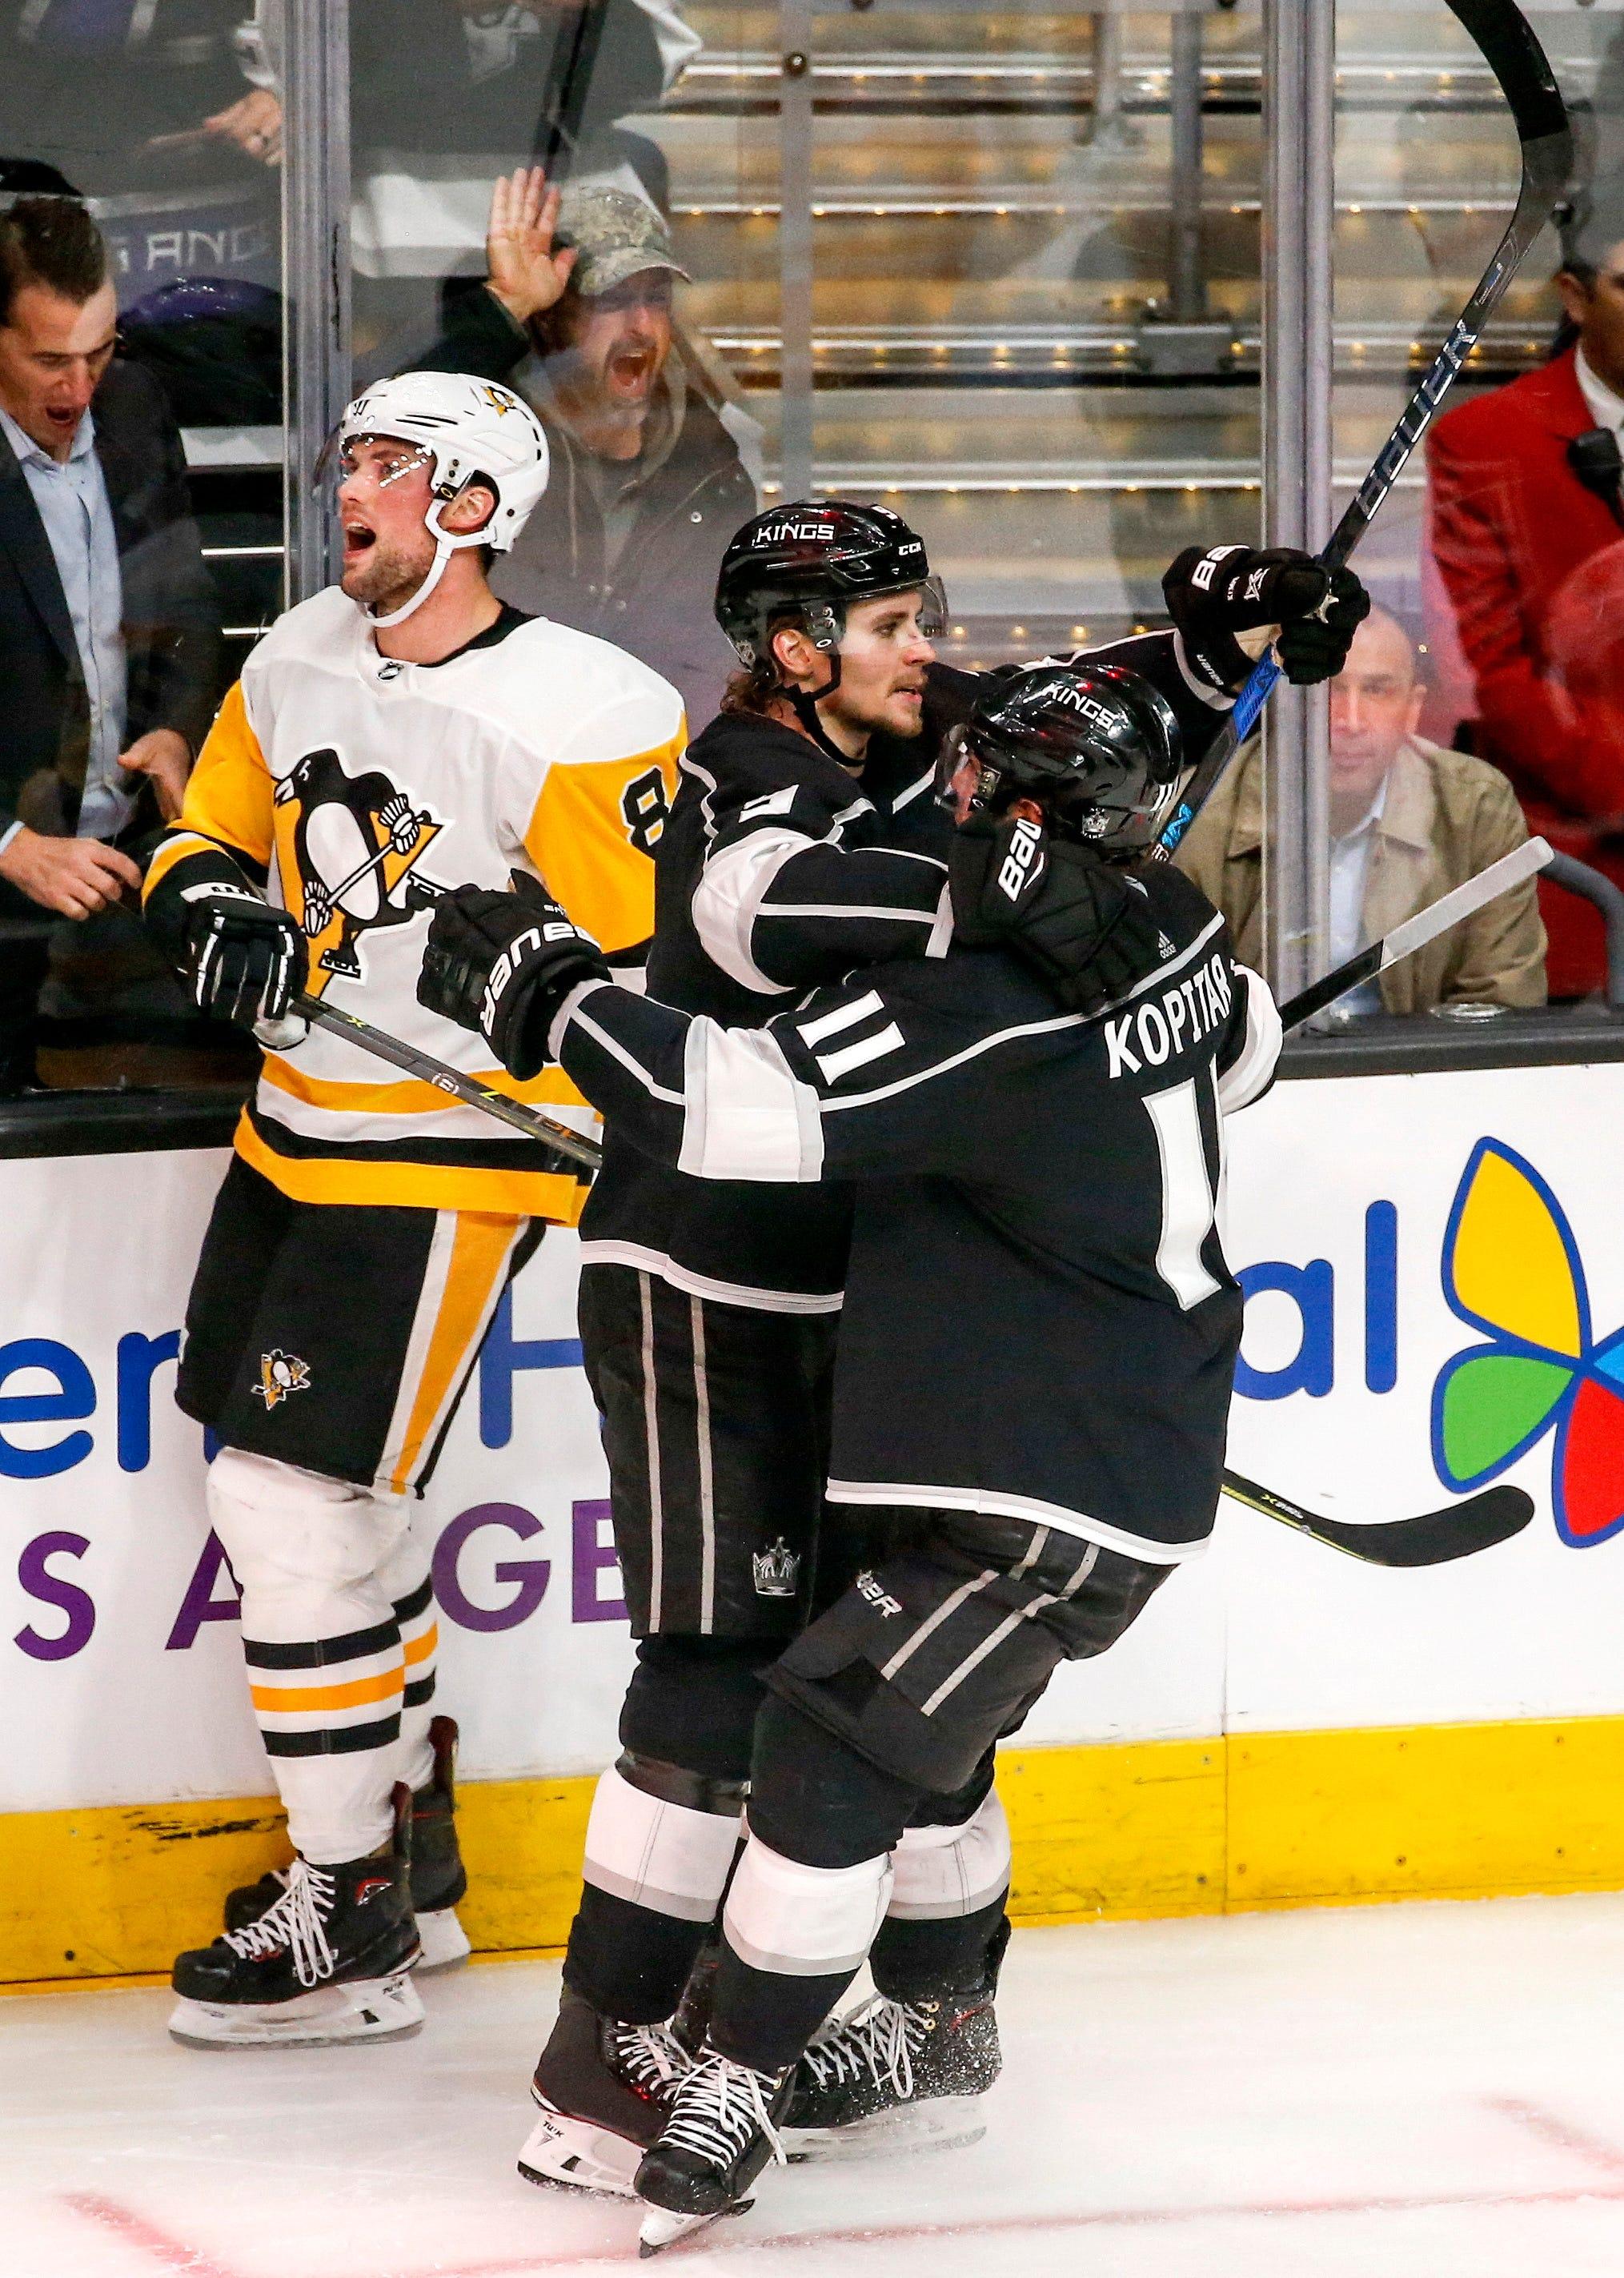 Hornqvist gets 2 goals, Penguins beat slumping LA Kings 3-1